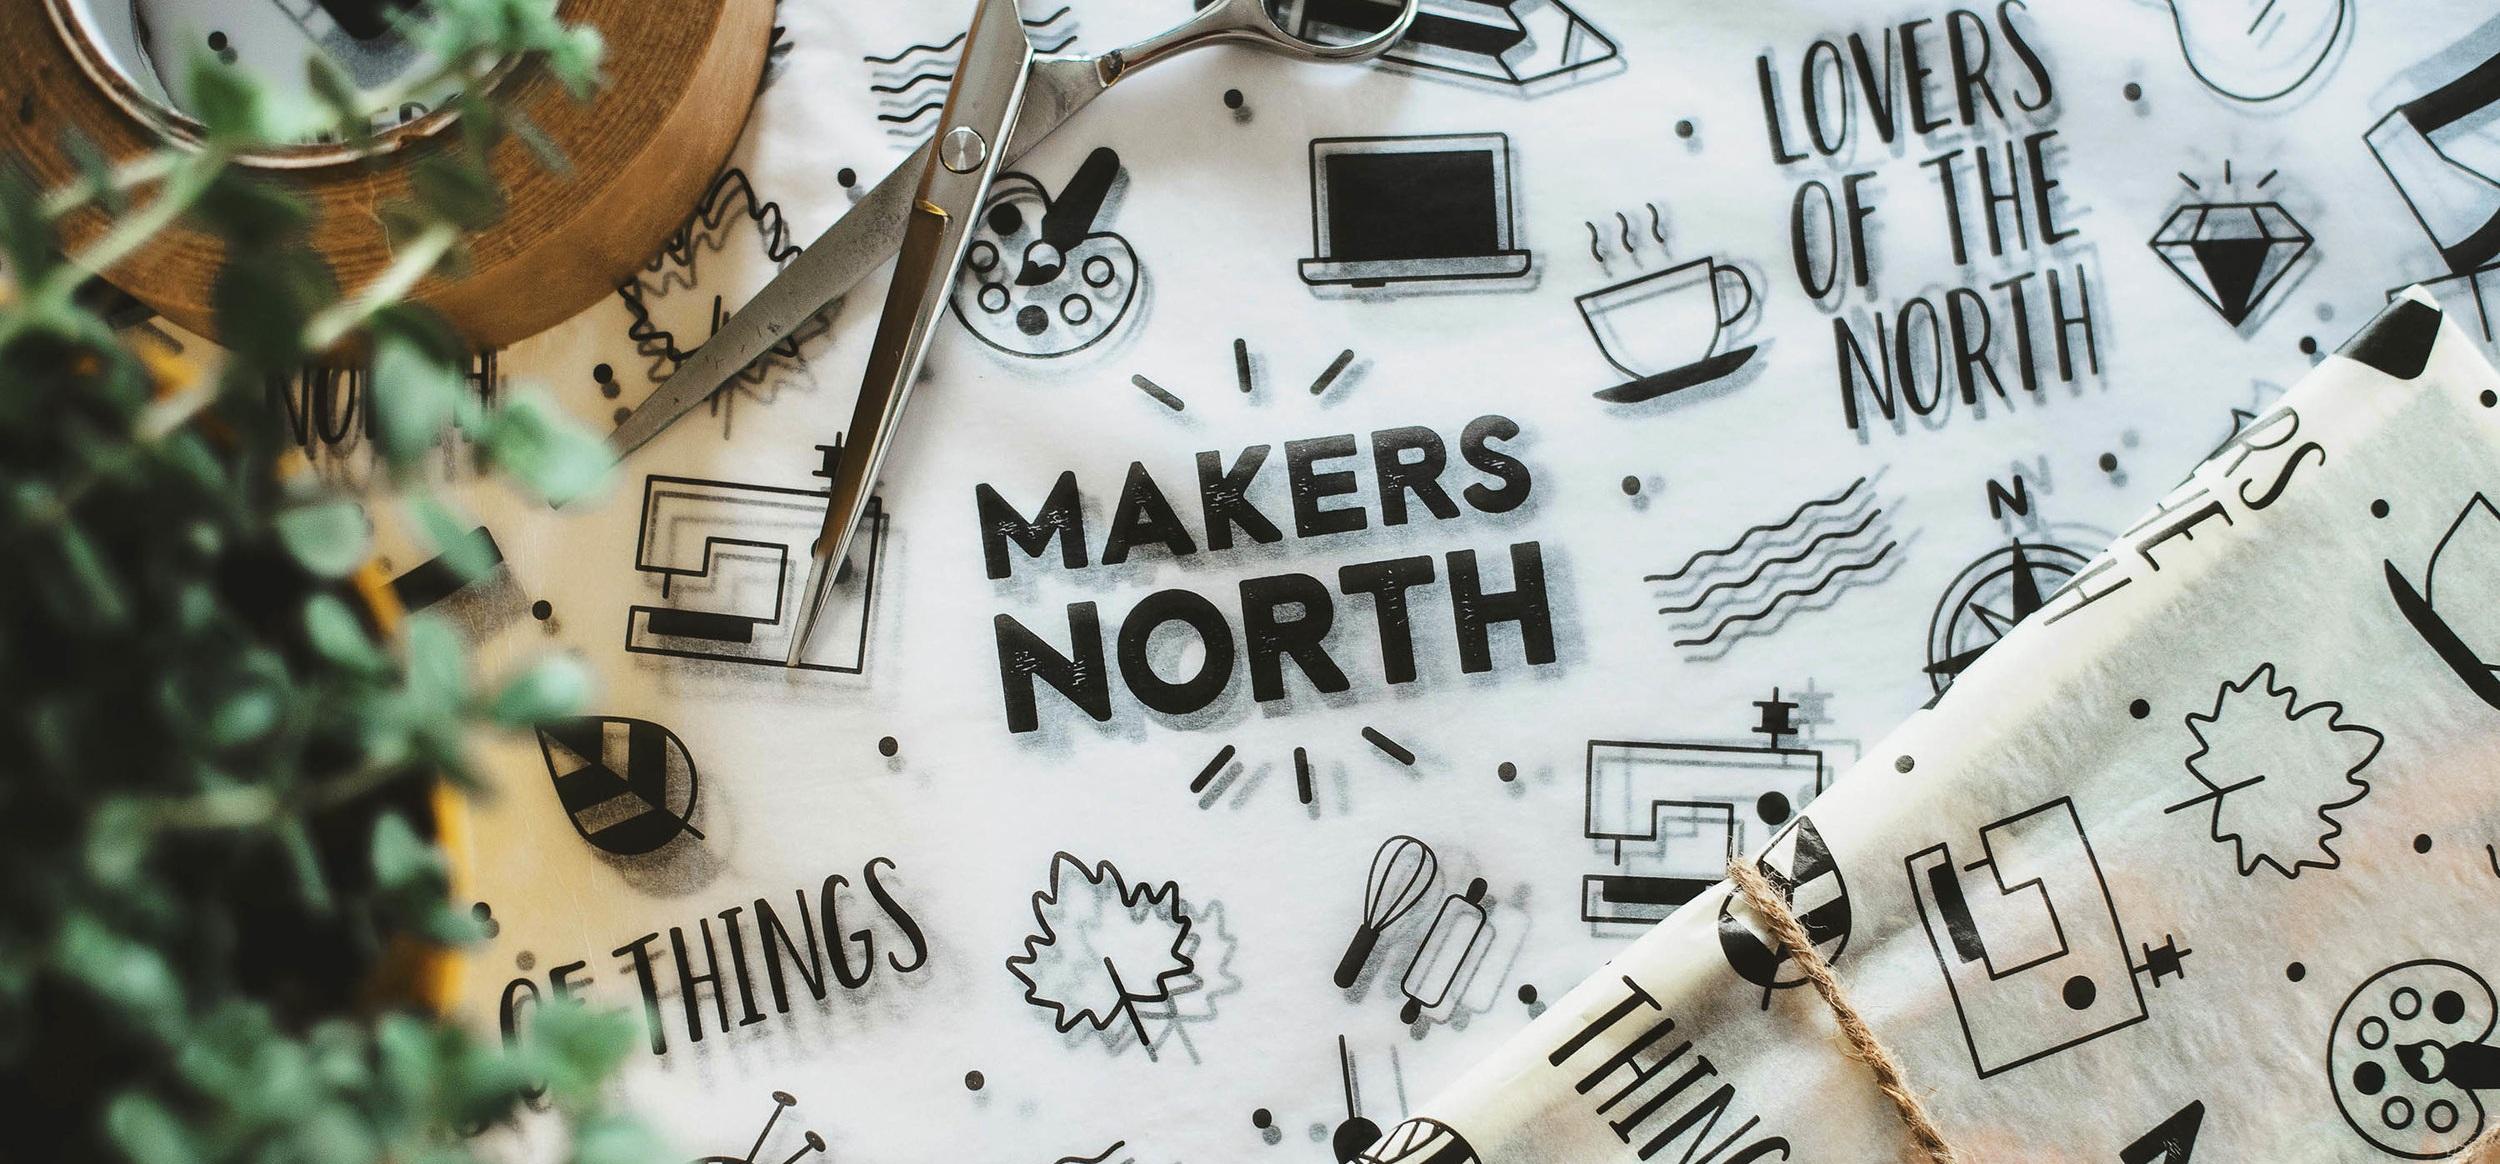 makersnorth.jpg